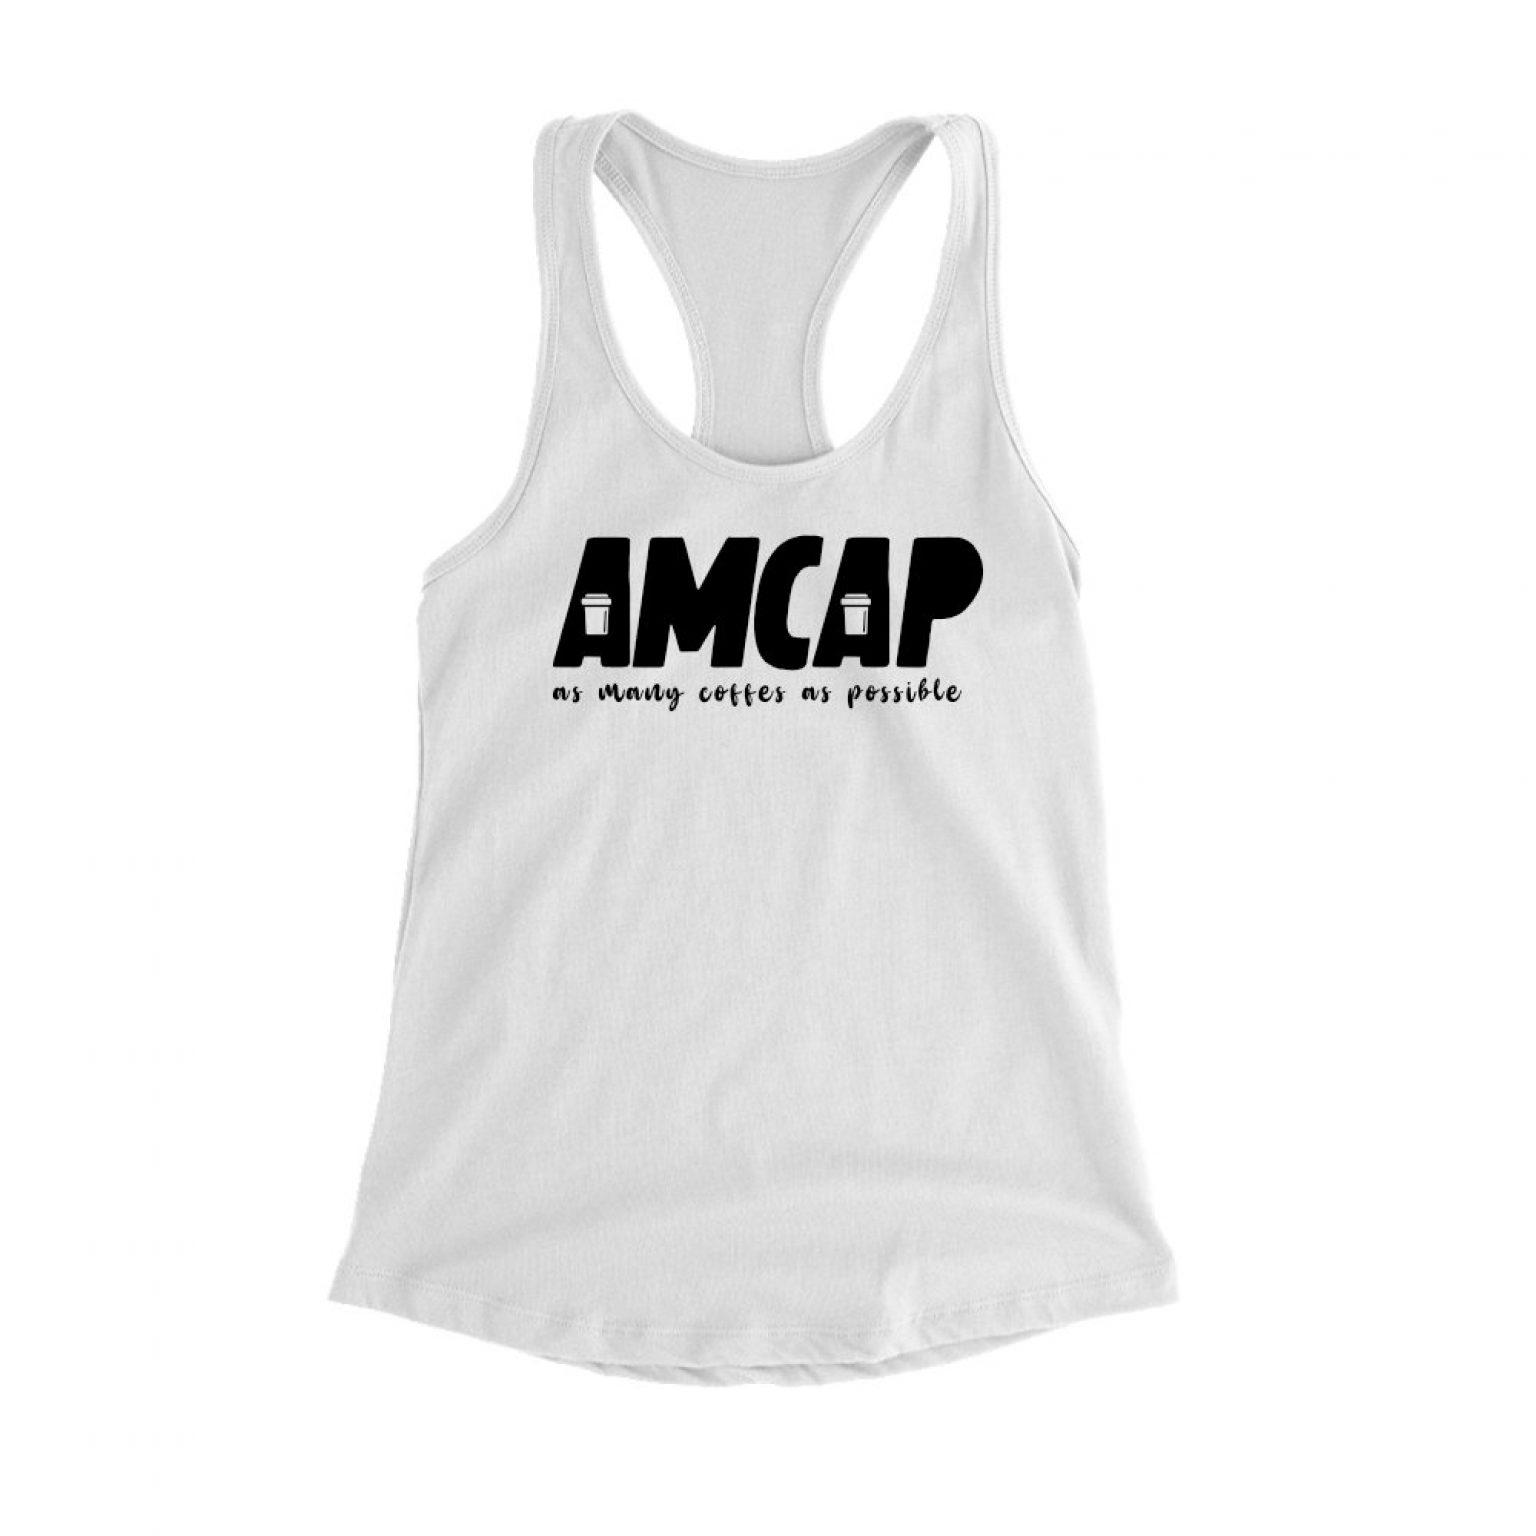 tanktop amcap white front